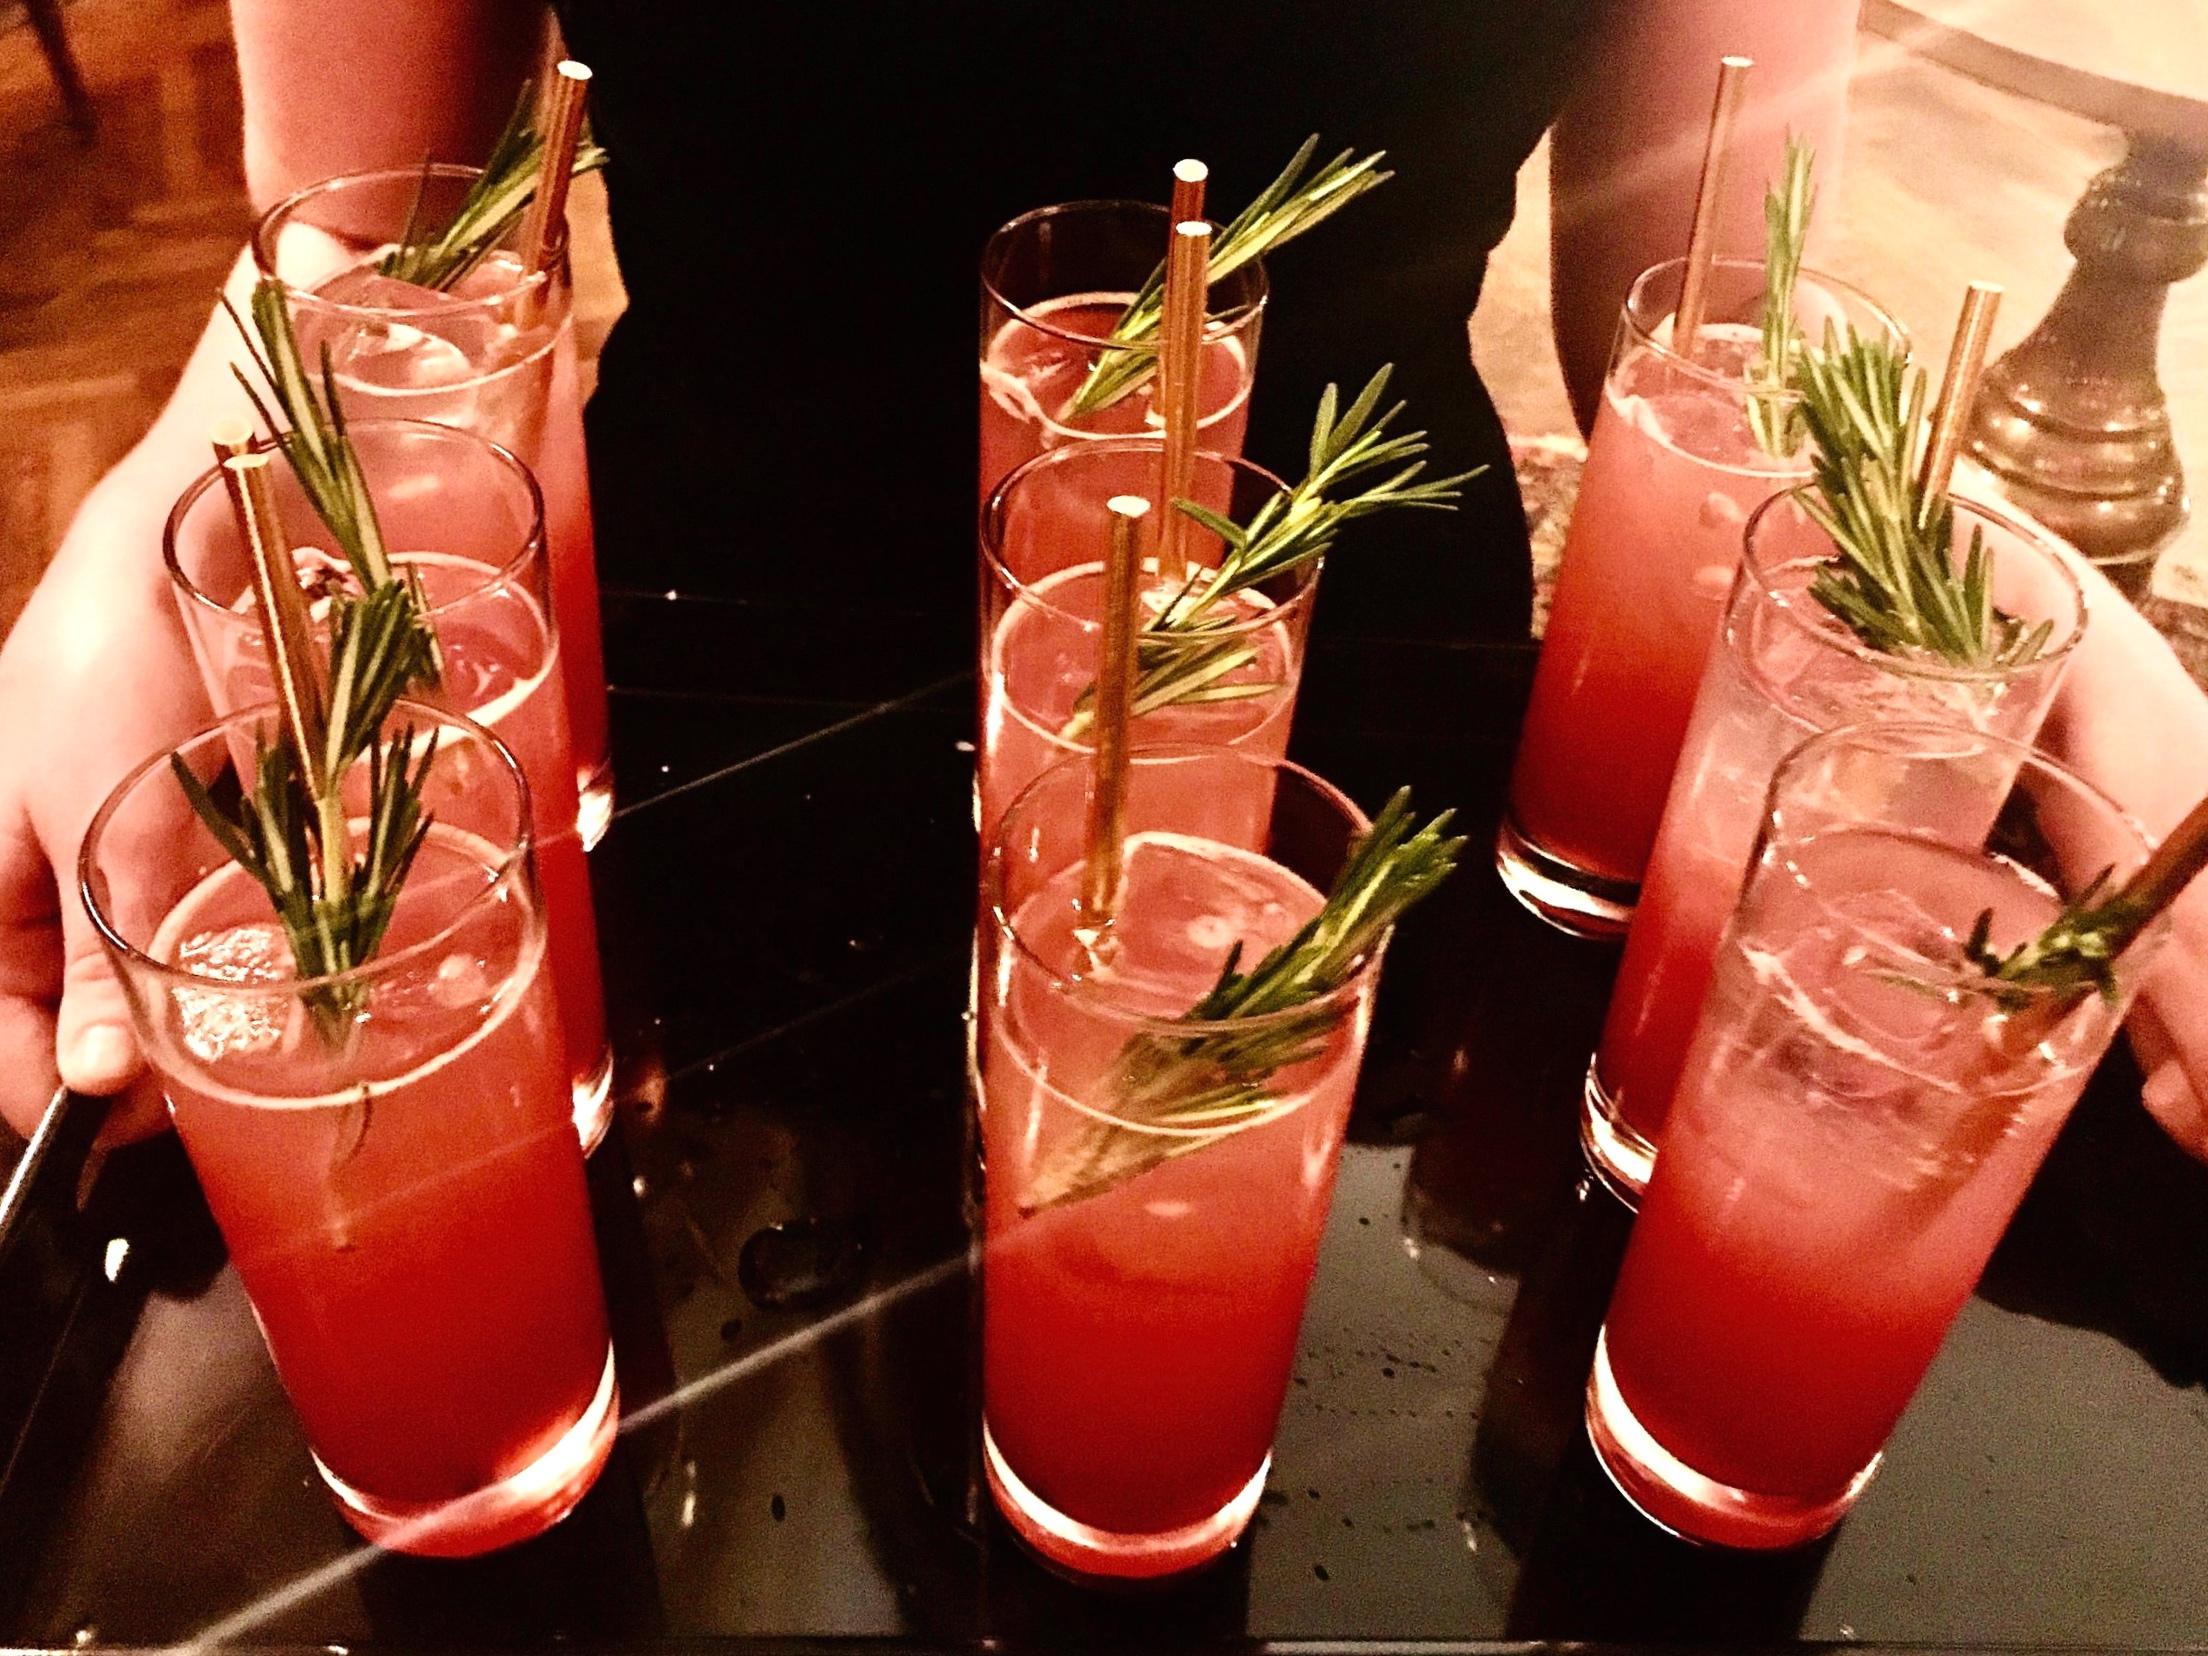 HIbiscus+Rosemary+Mocktails.jpg